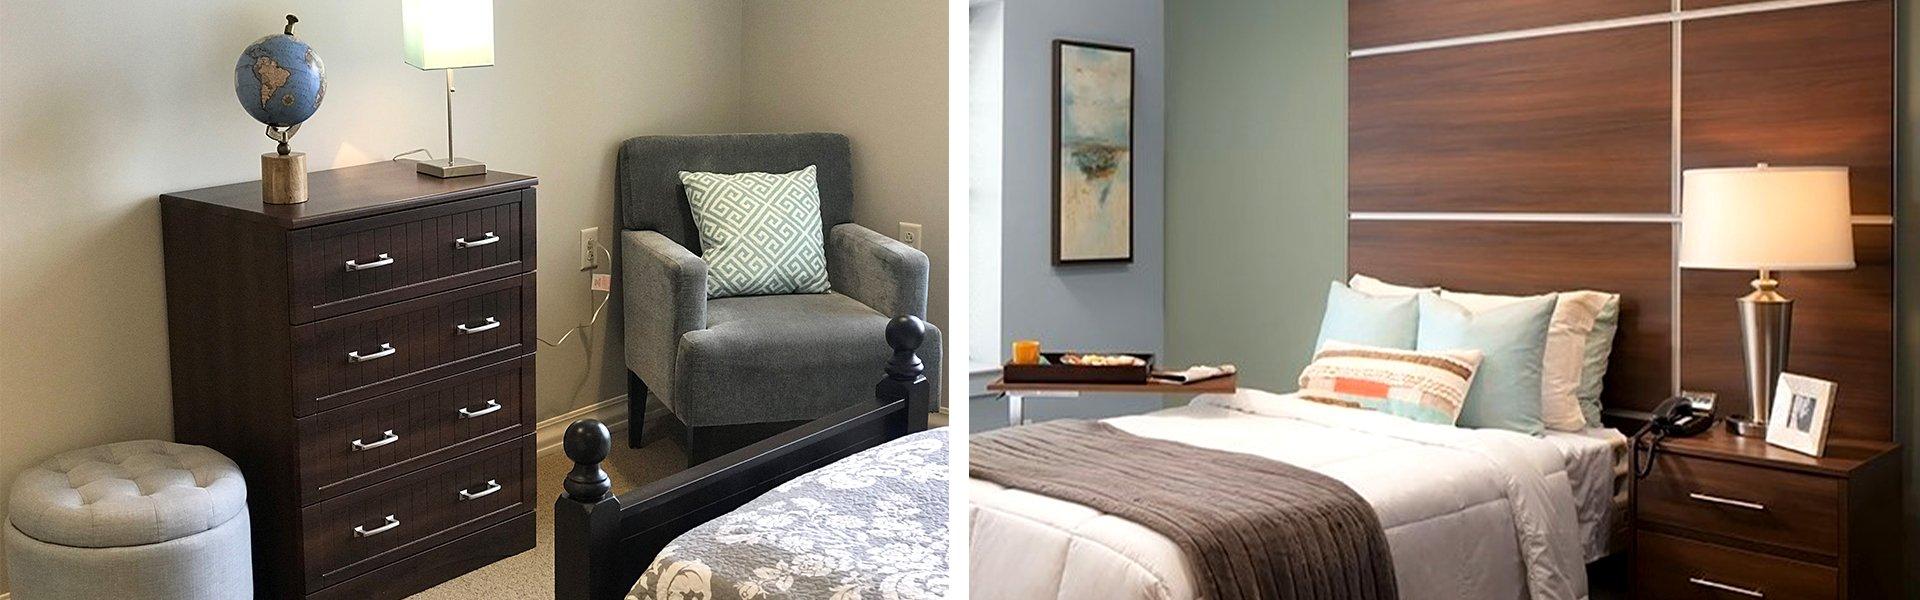 CFC Healthcare Patient Room Furniture